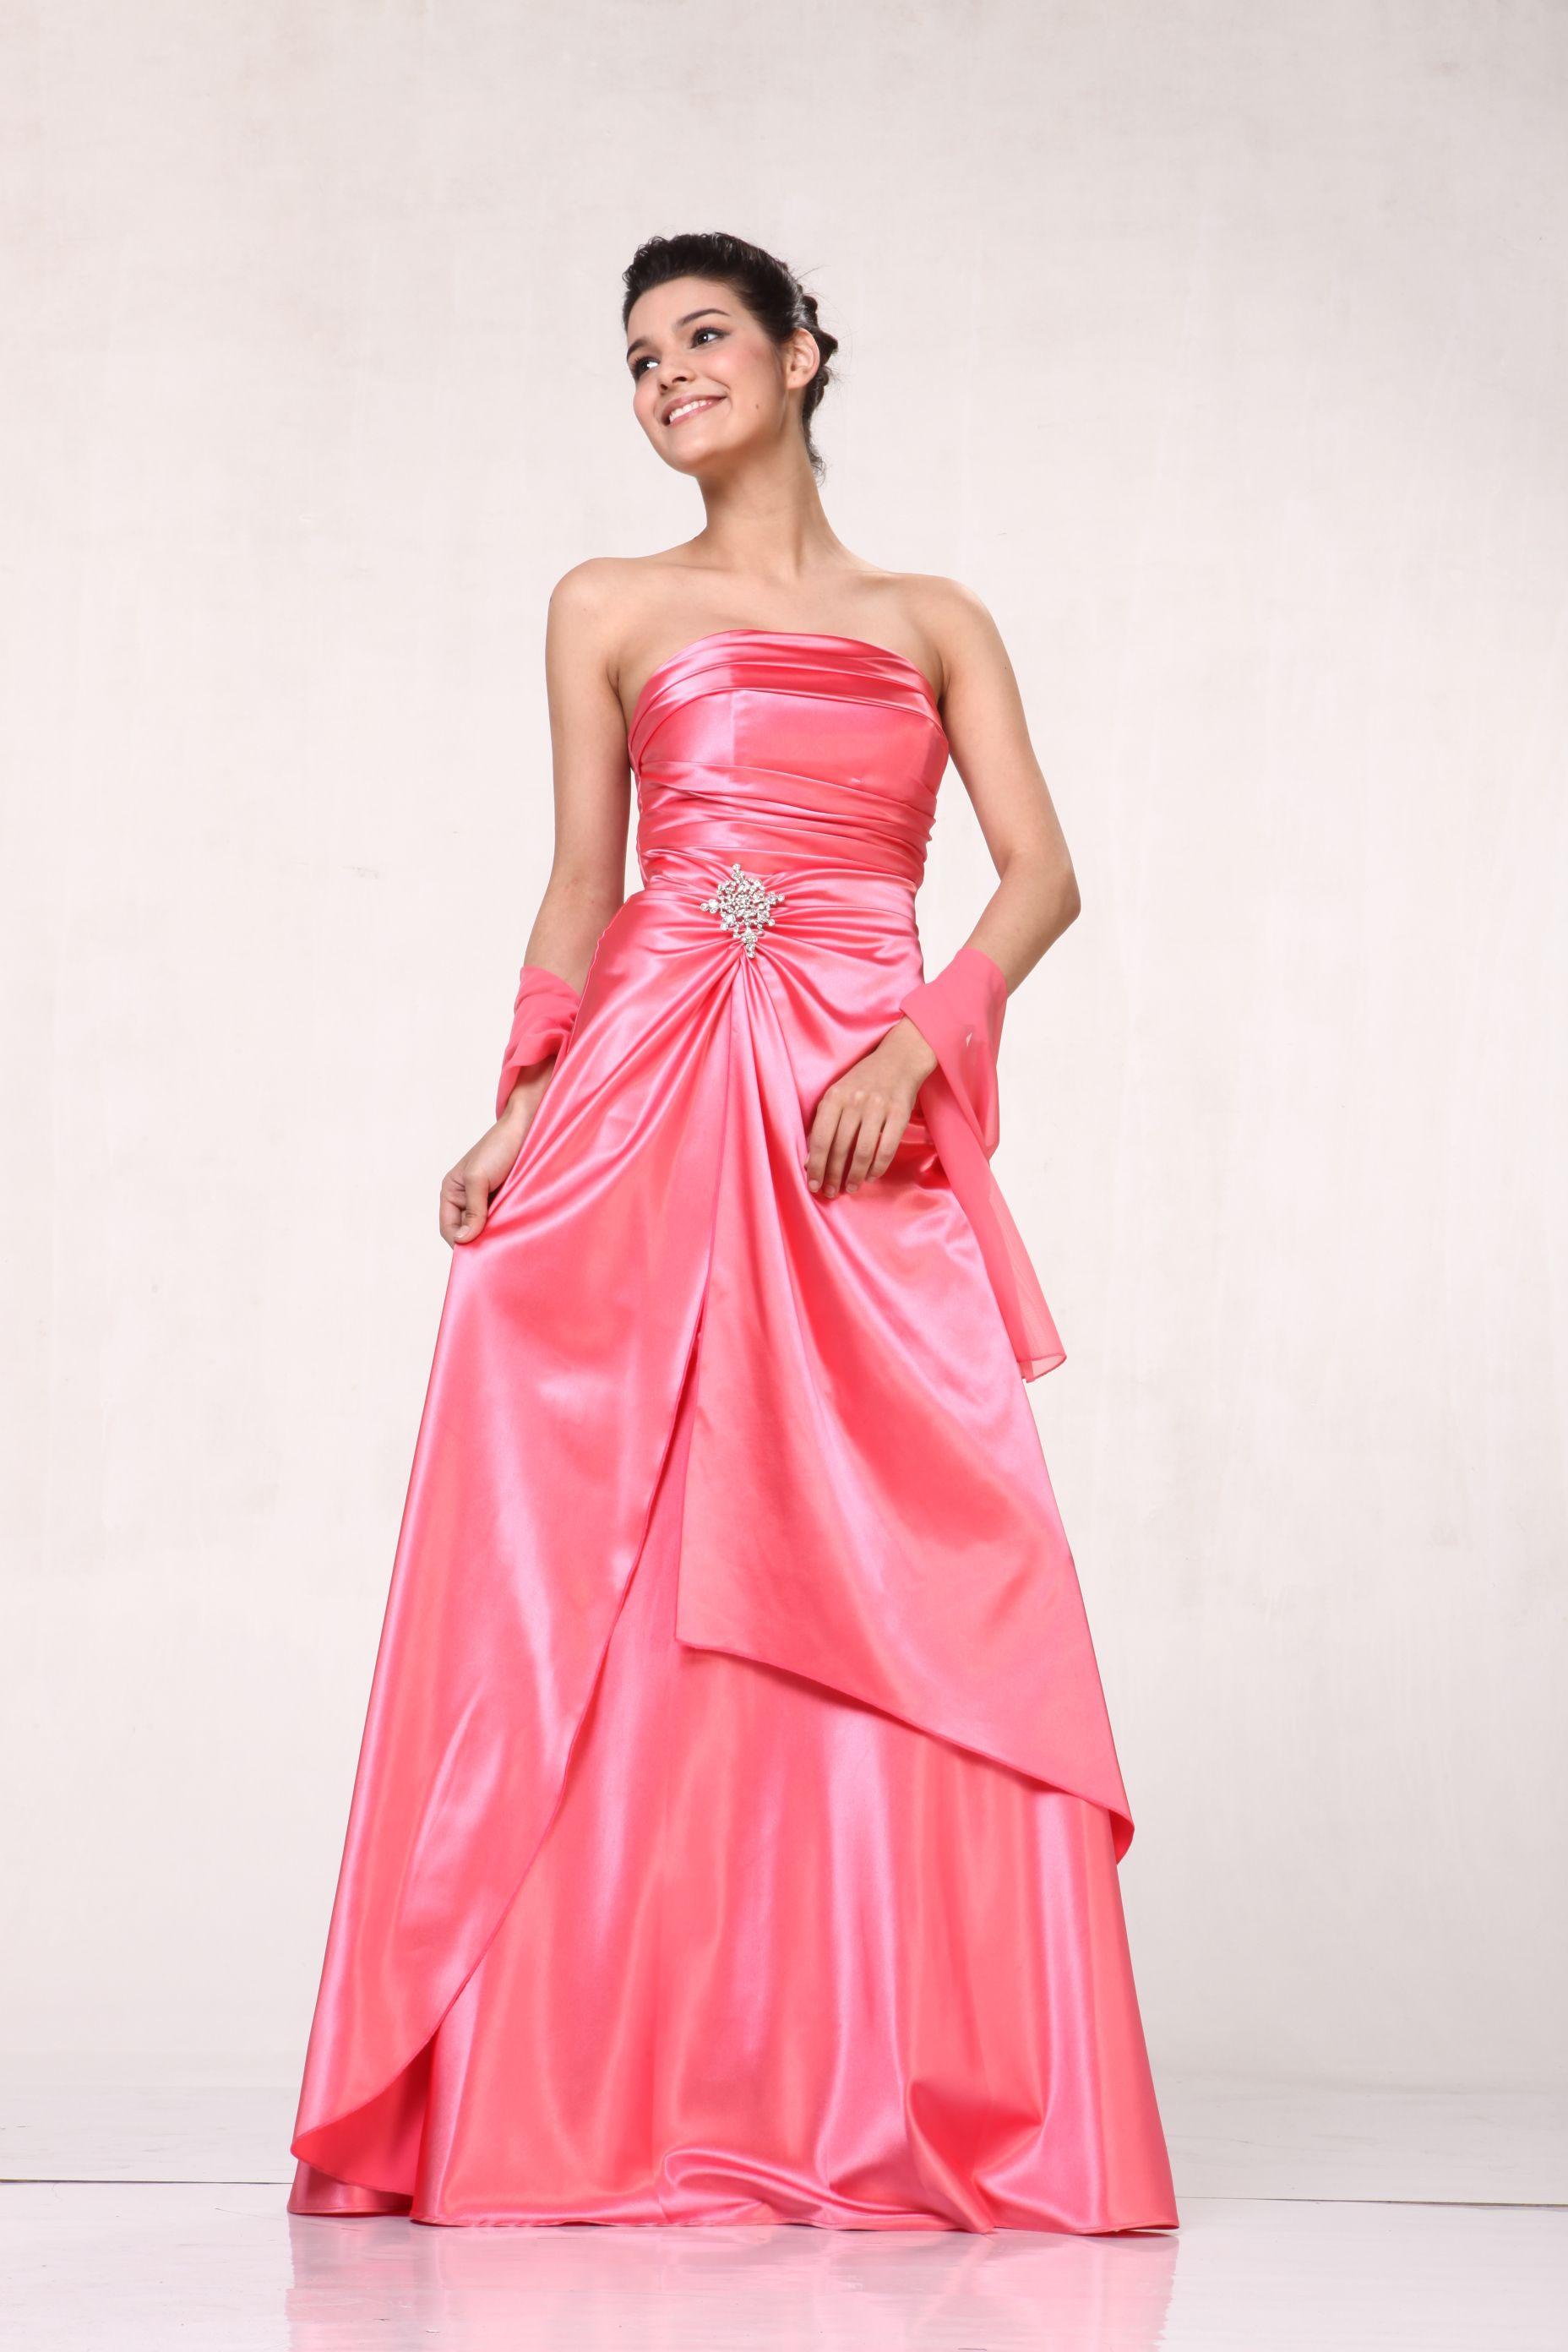 bf1c7786a09 Coral Satin Bridesmaid Dresses - Gomes Weine AG